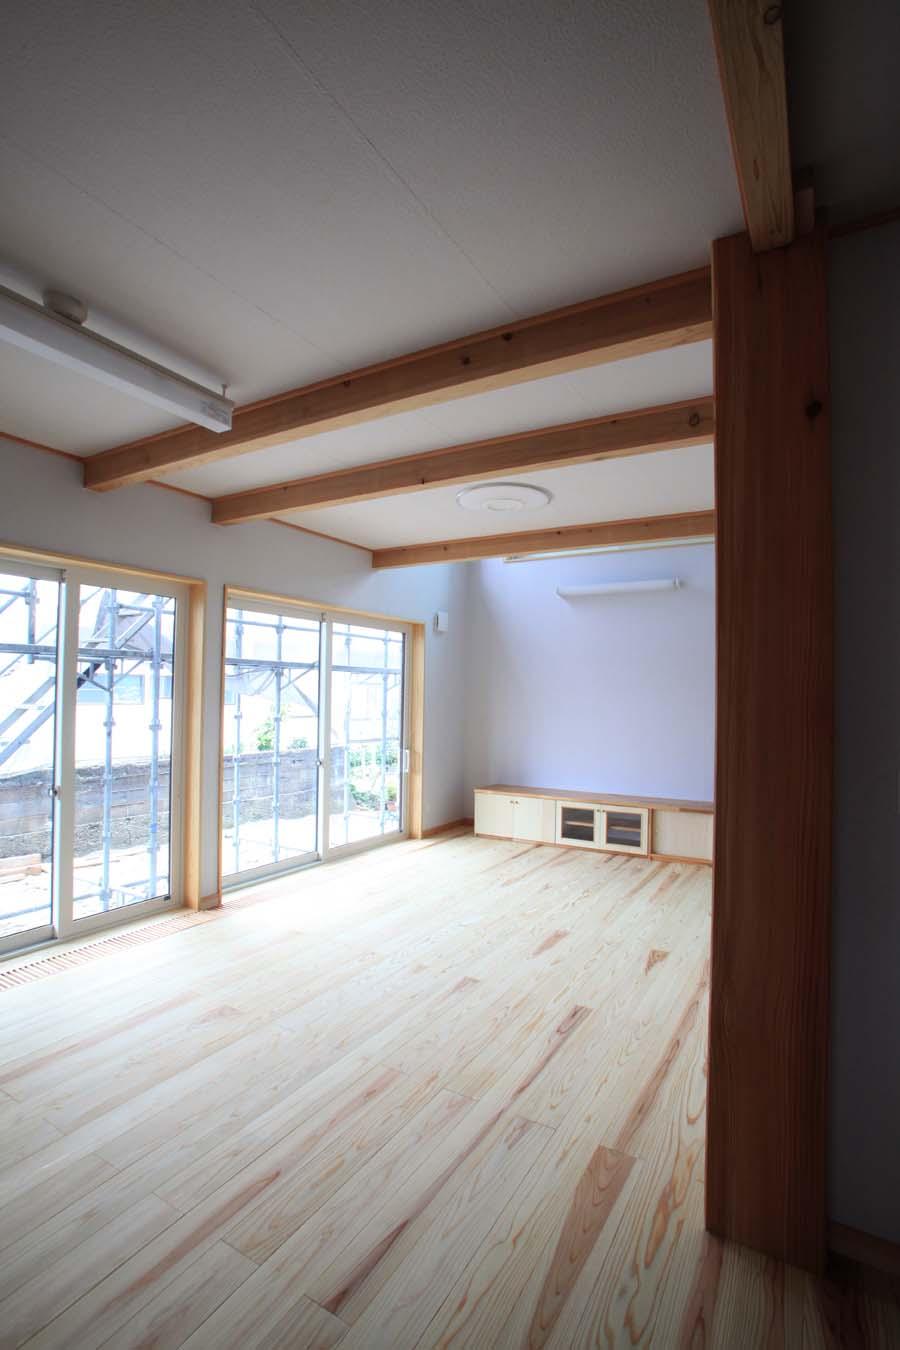 A様邸「二ツ井太田面の家」_f0150893_17264473.jpg